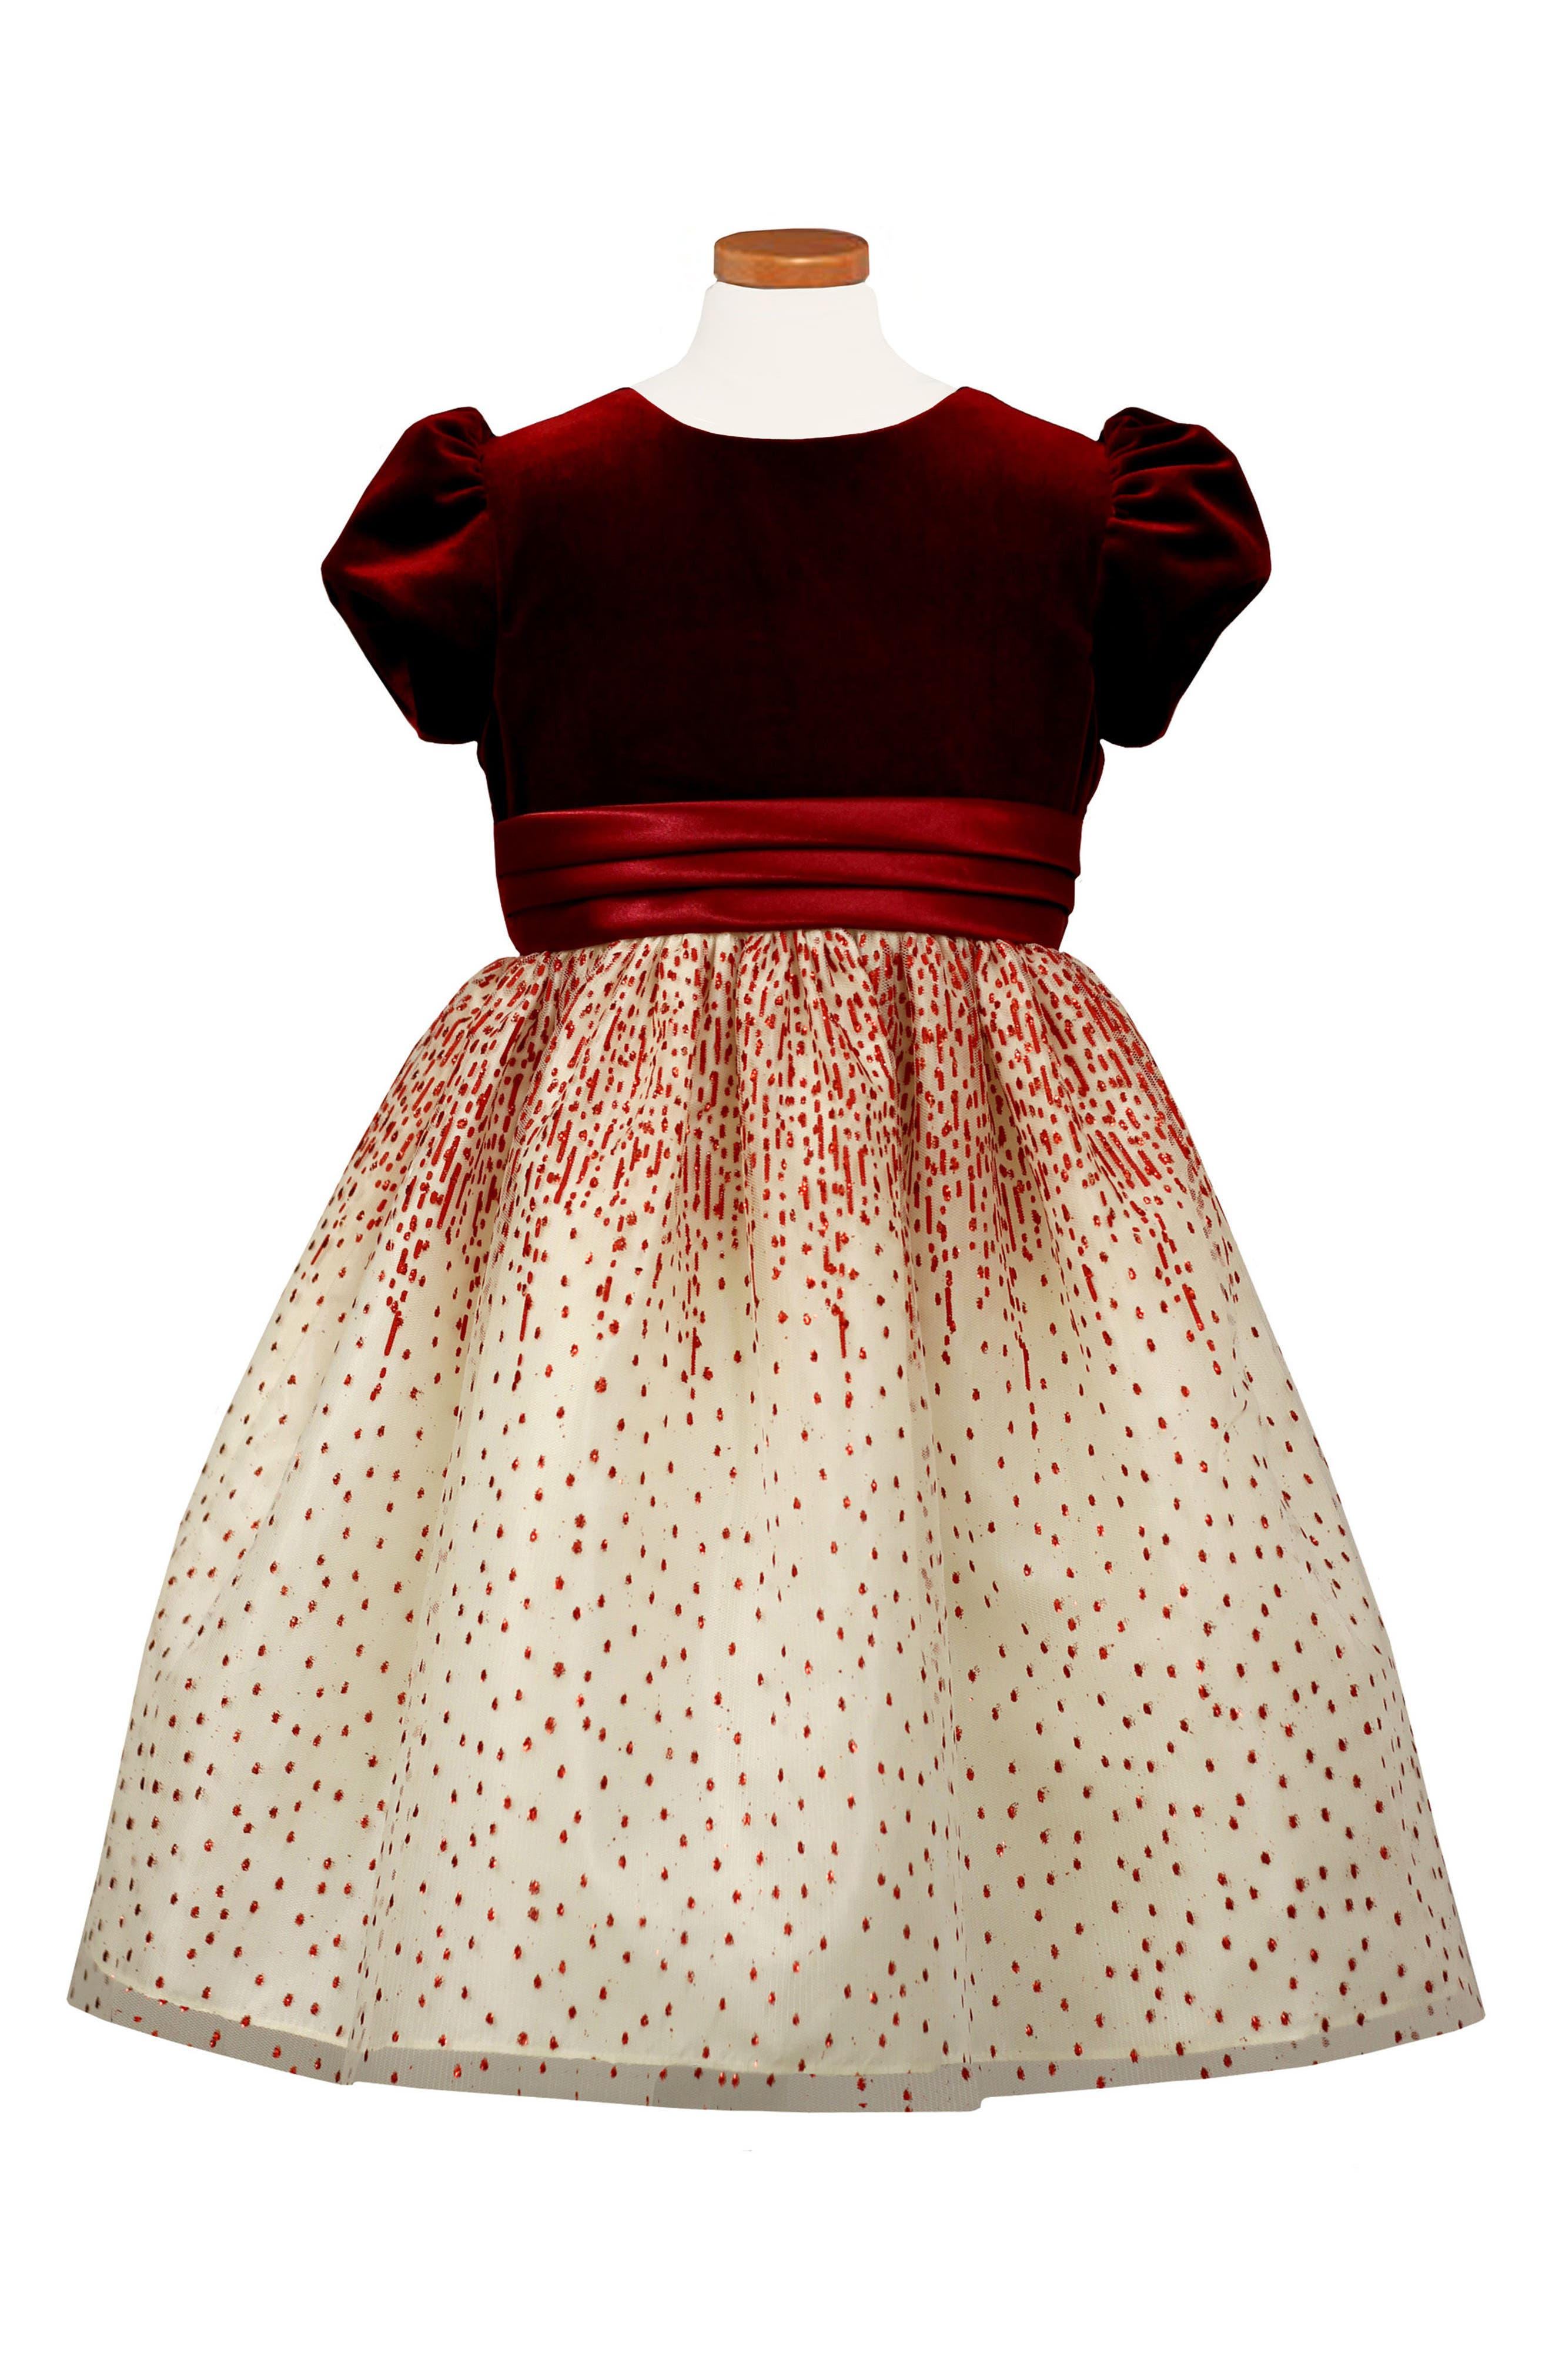 Velvet Bodice Party Dress,                             Main thumbnail 1, color,                             600